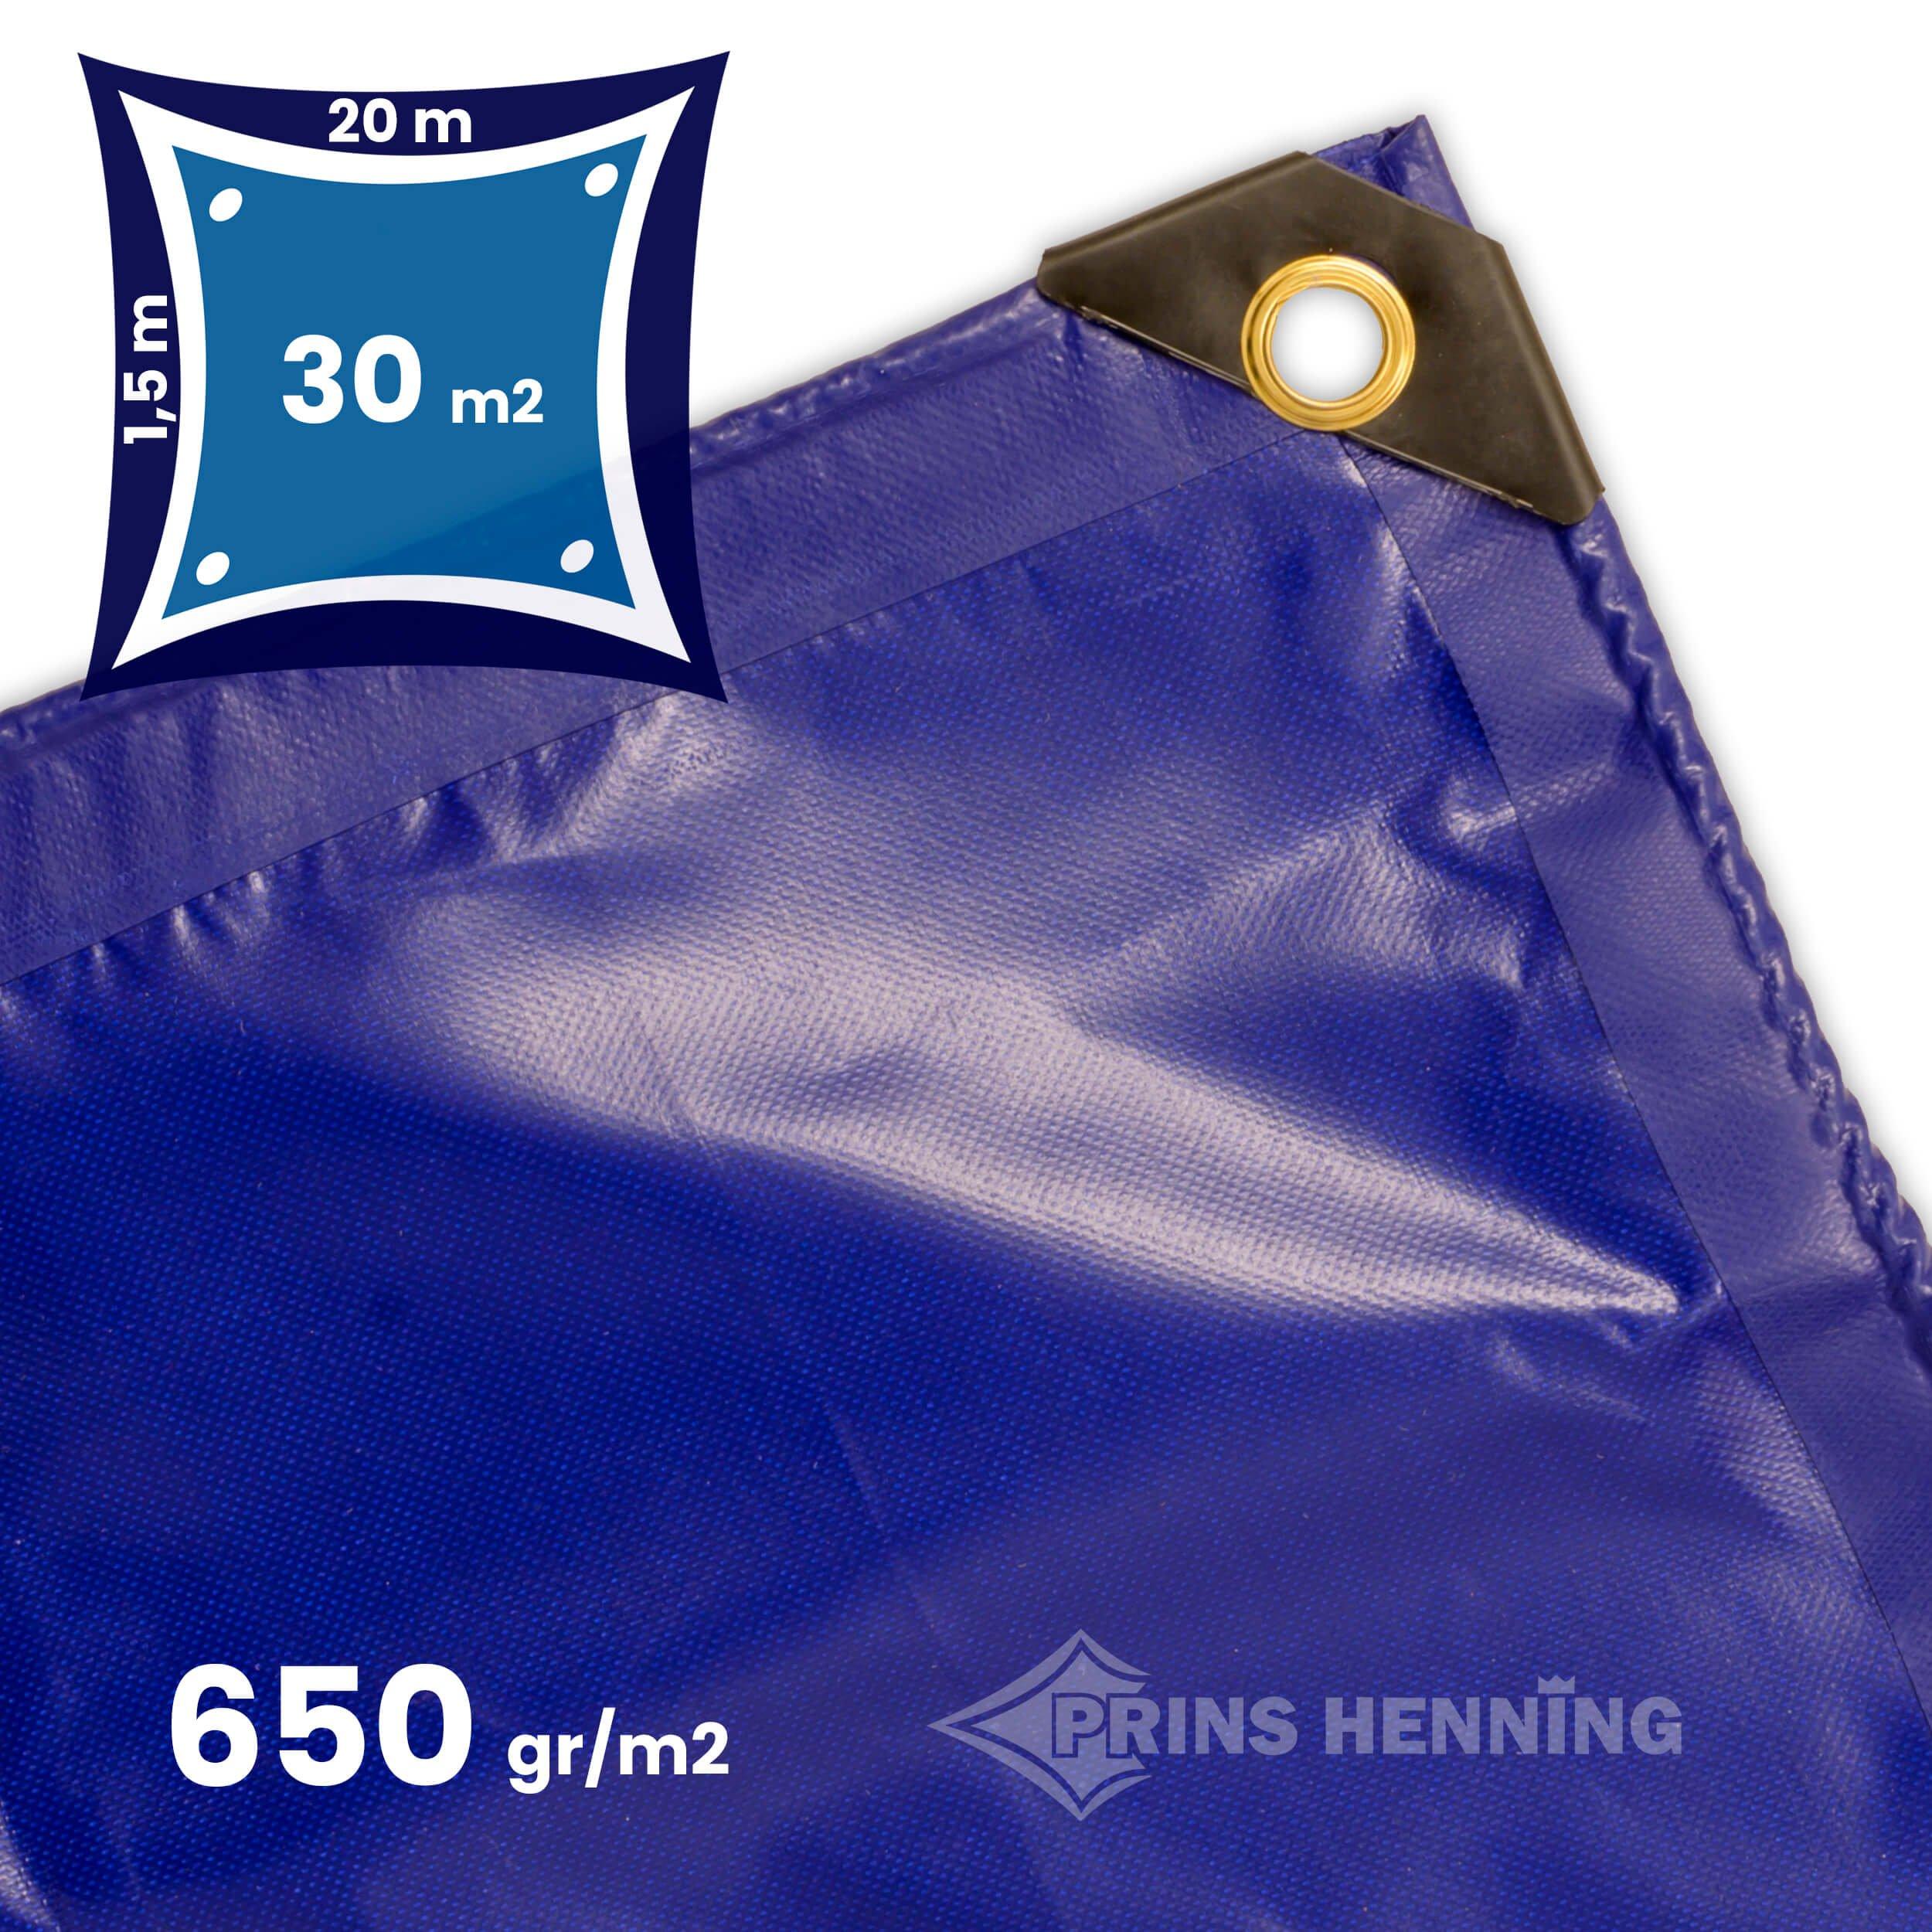 Professionel  presenning, 1,5x20 meter, blå, kraftig kvalitet, 650 gr/m2